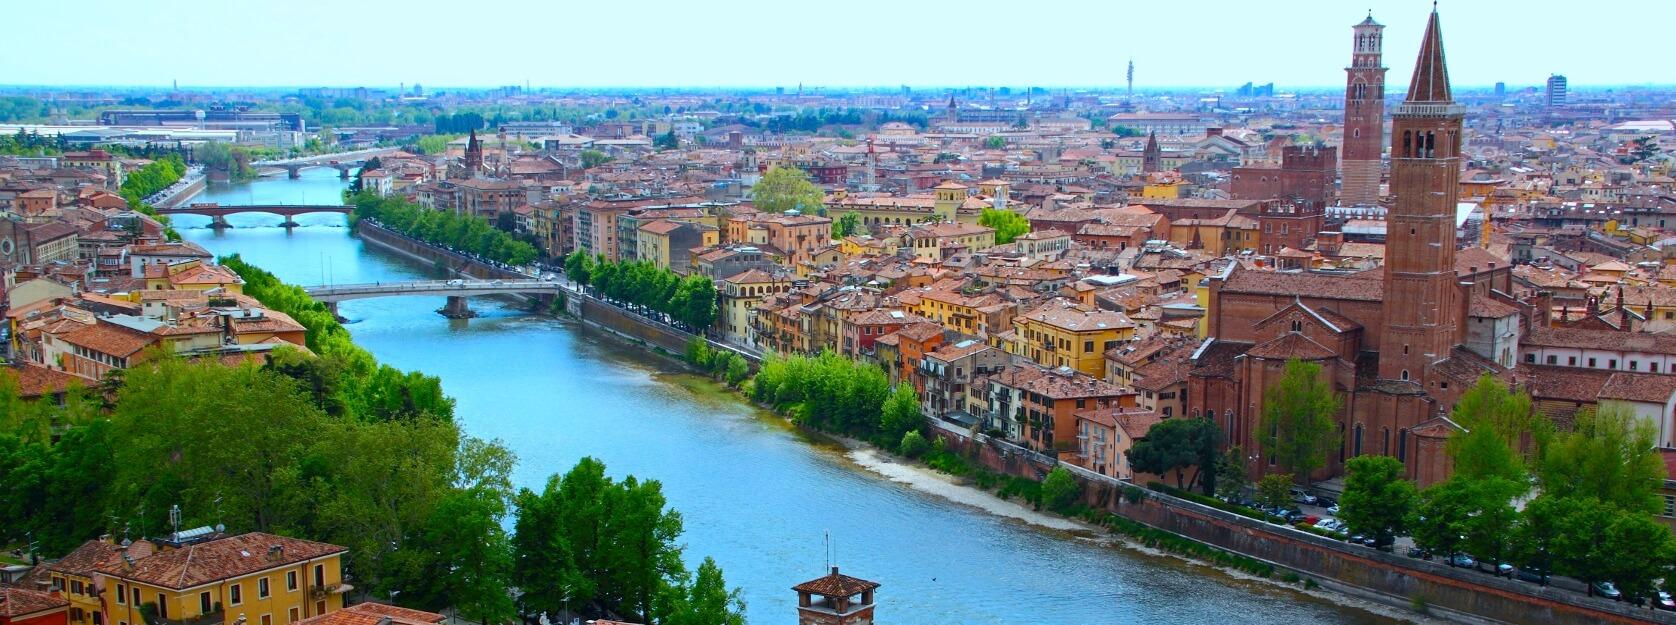 Cheap flights to Verona